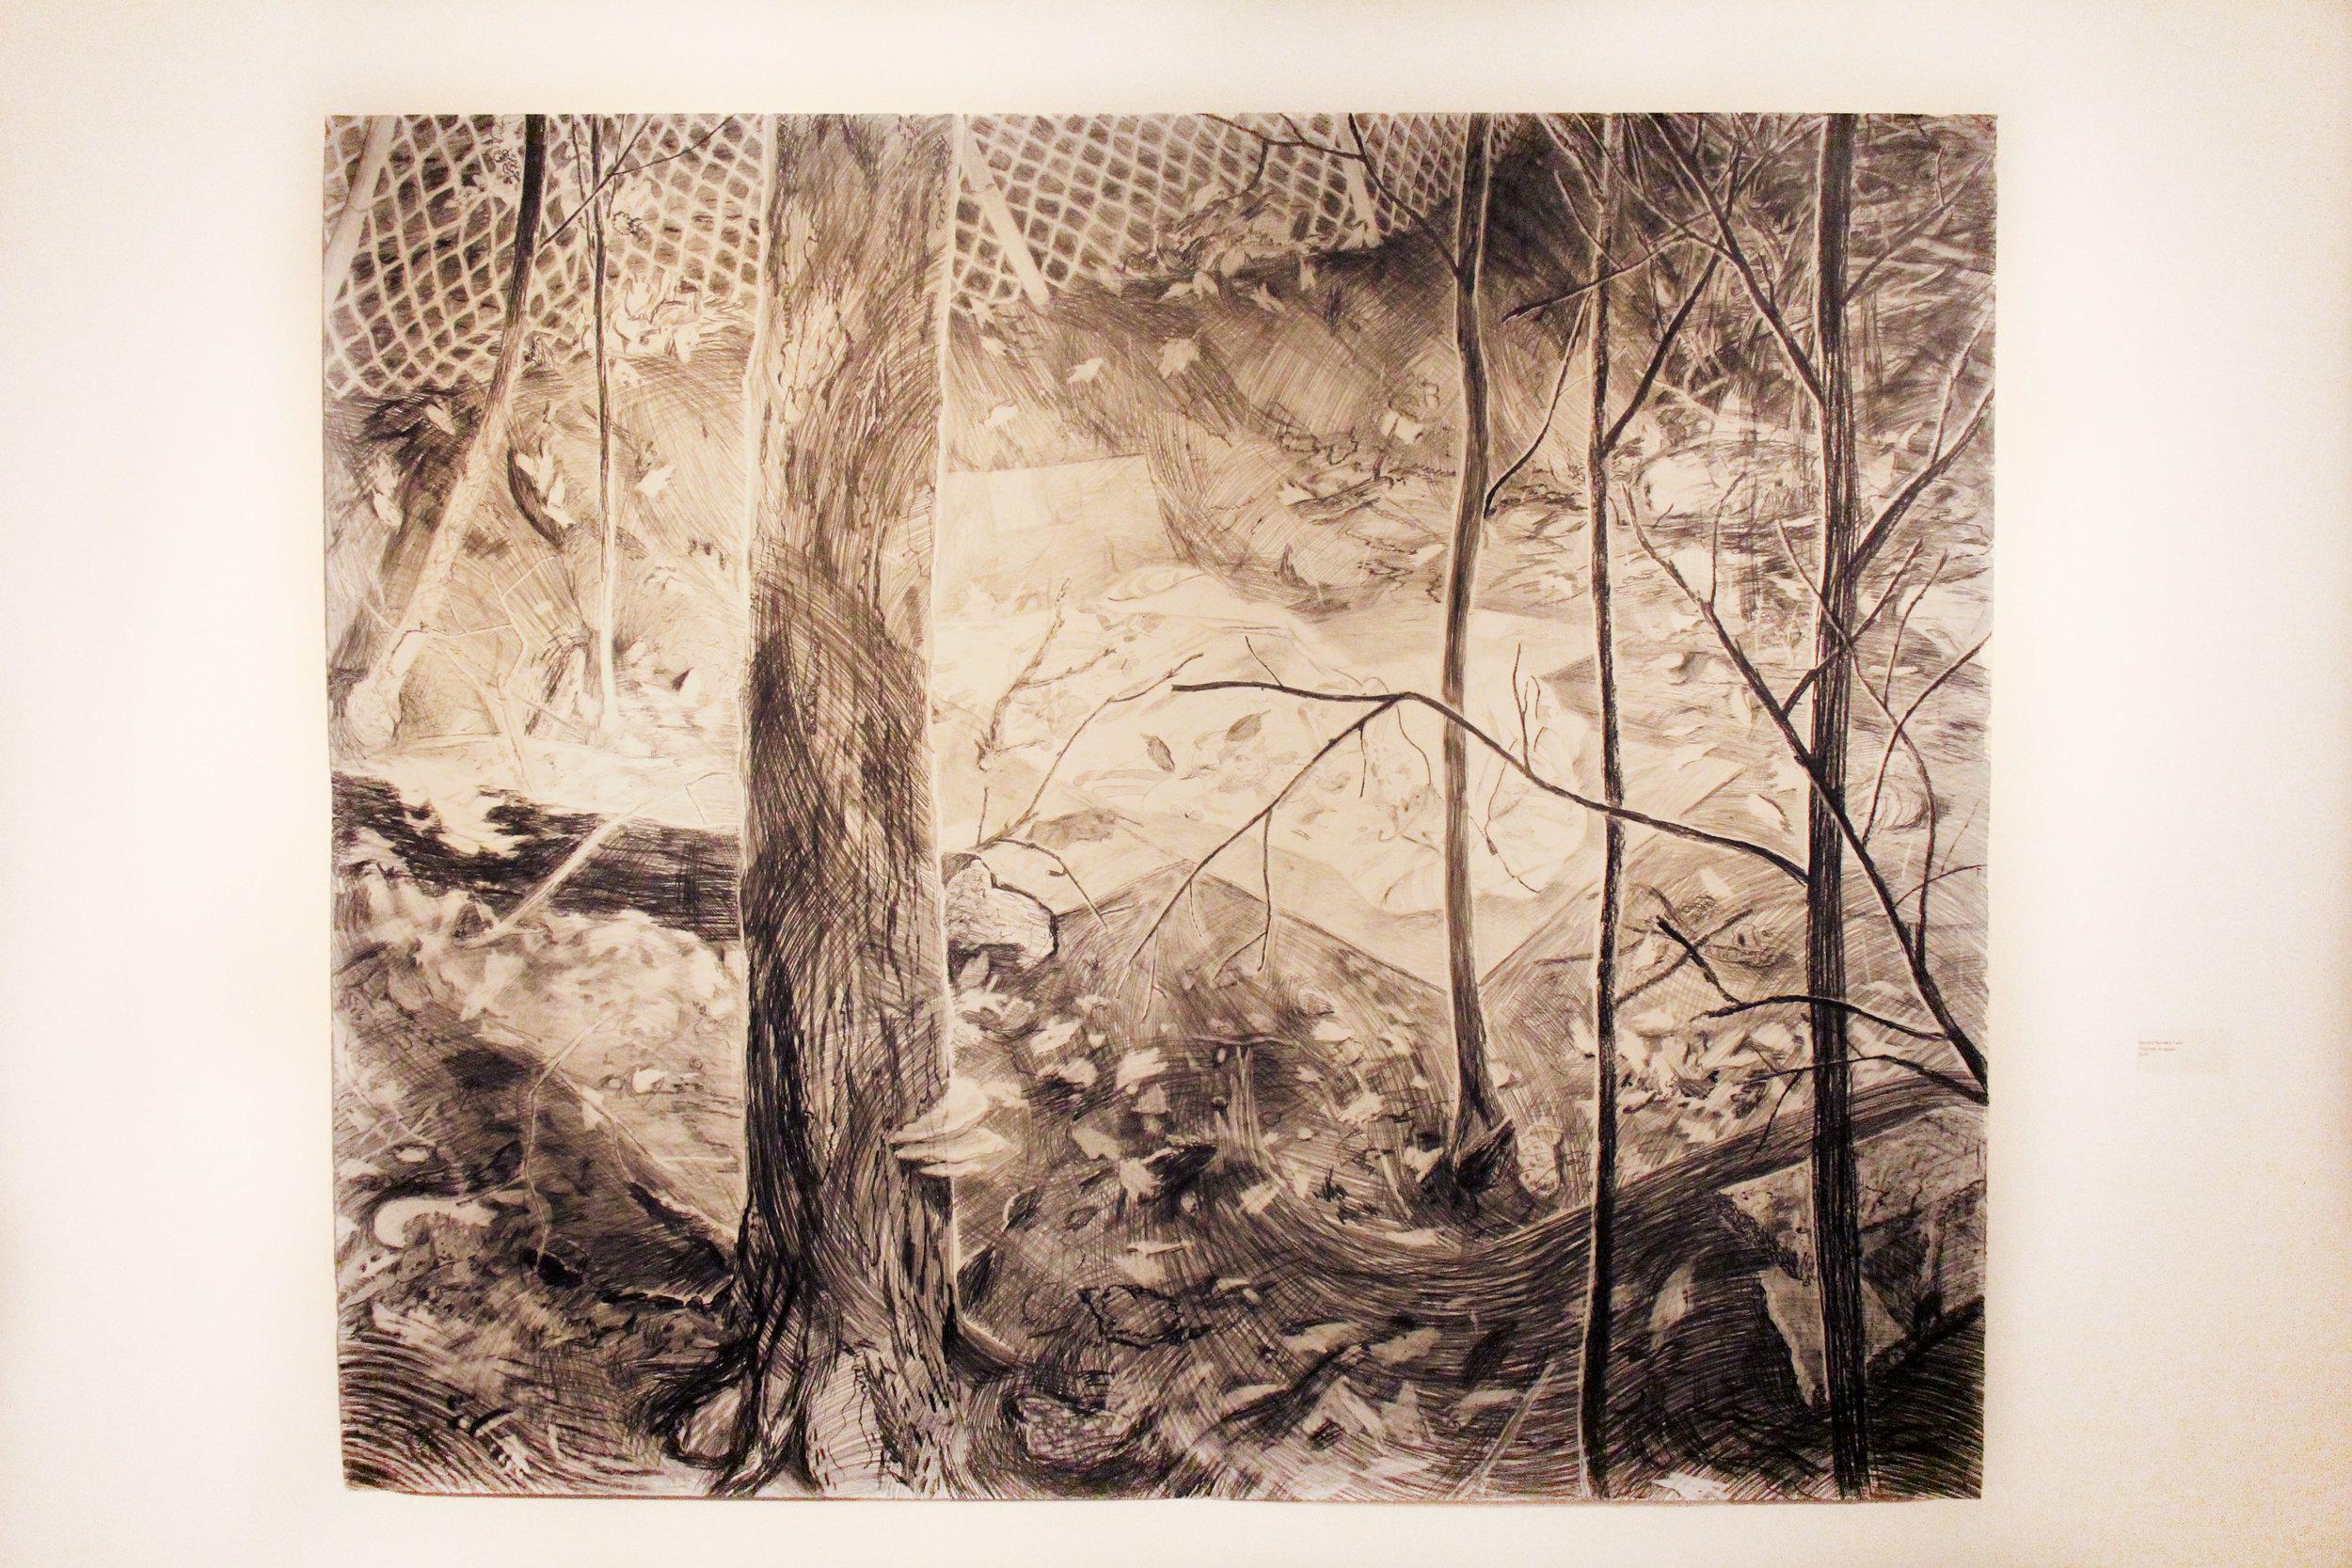 Beyond Rachel's Yard;  Graphite on paper; 2010